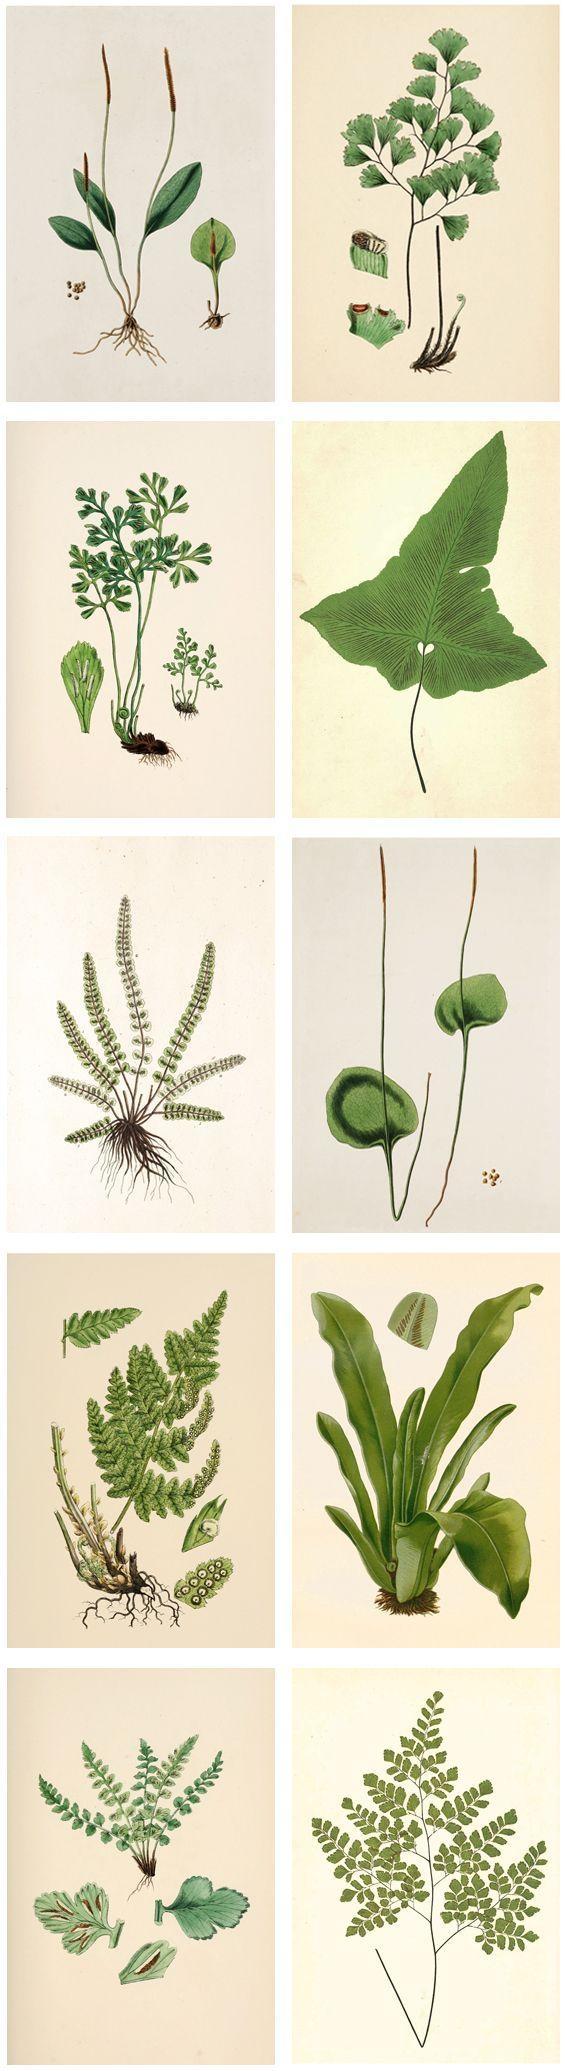 Best 25+ Plant Art Ideas On Pinterest | Kitchen Plants, Window Inside Floral & Plant Wall Art (Photo 4 of 20)